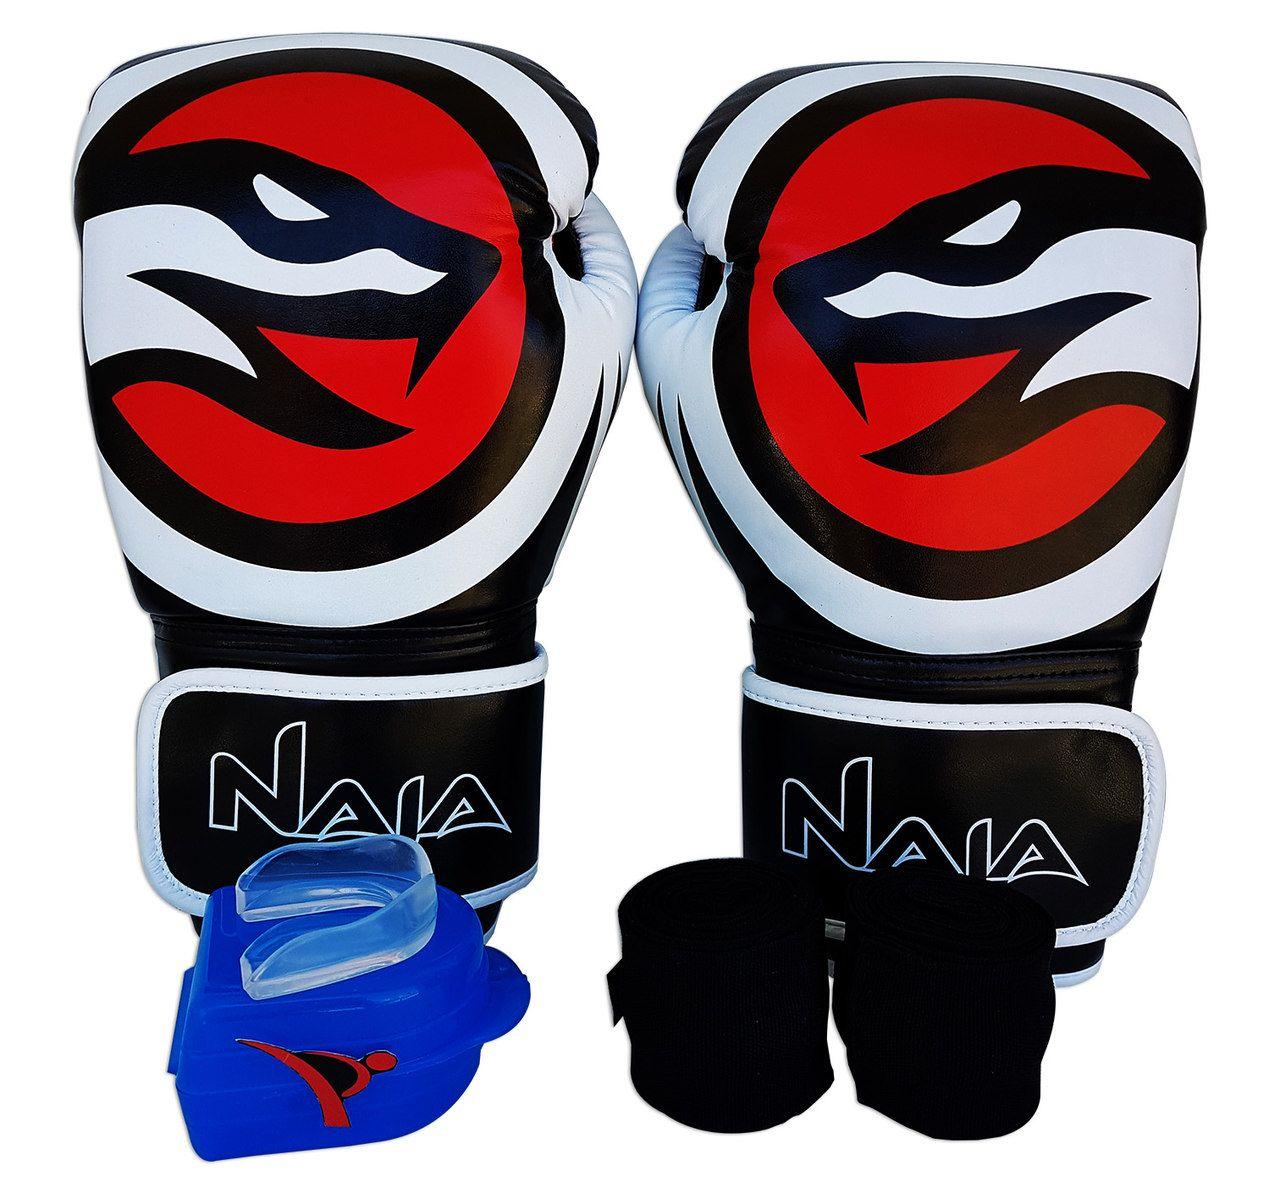 Kit De Boxe / Muay Thai 14oz - Preto - OPP - Naja  - PRALUTA SHOP